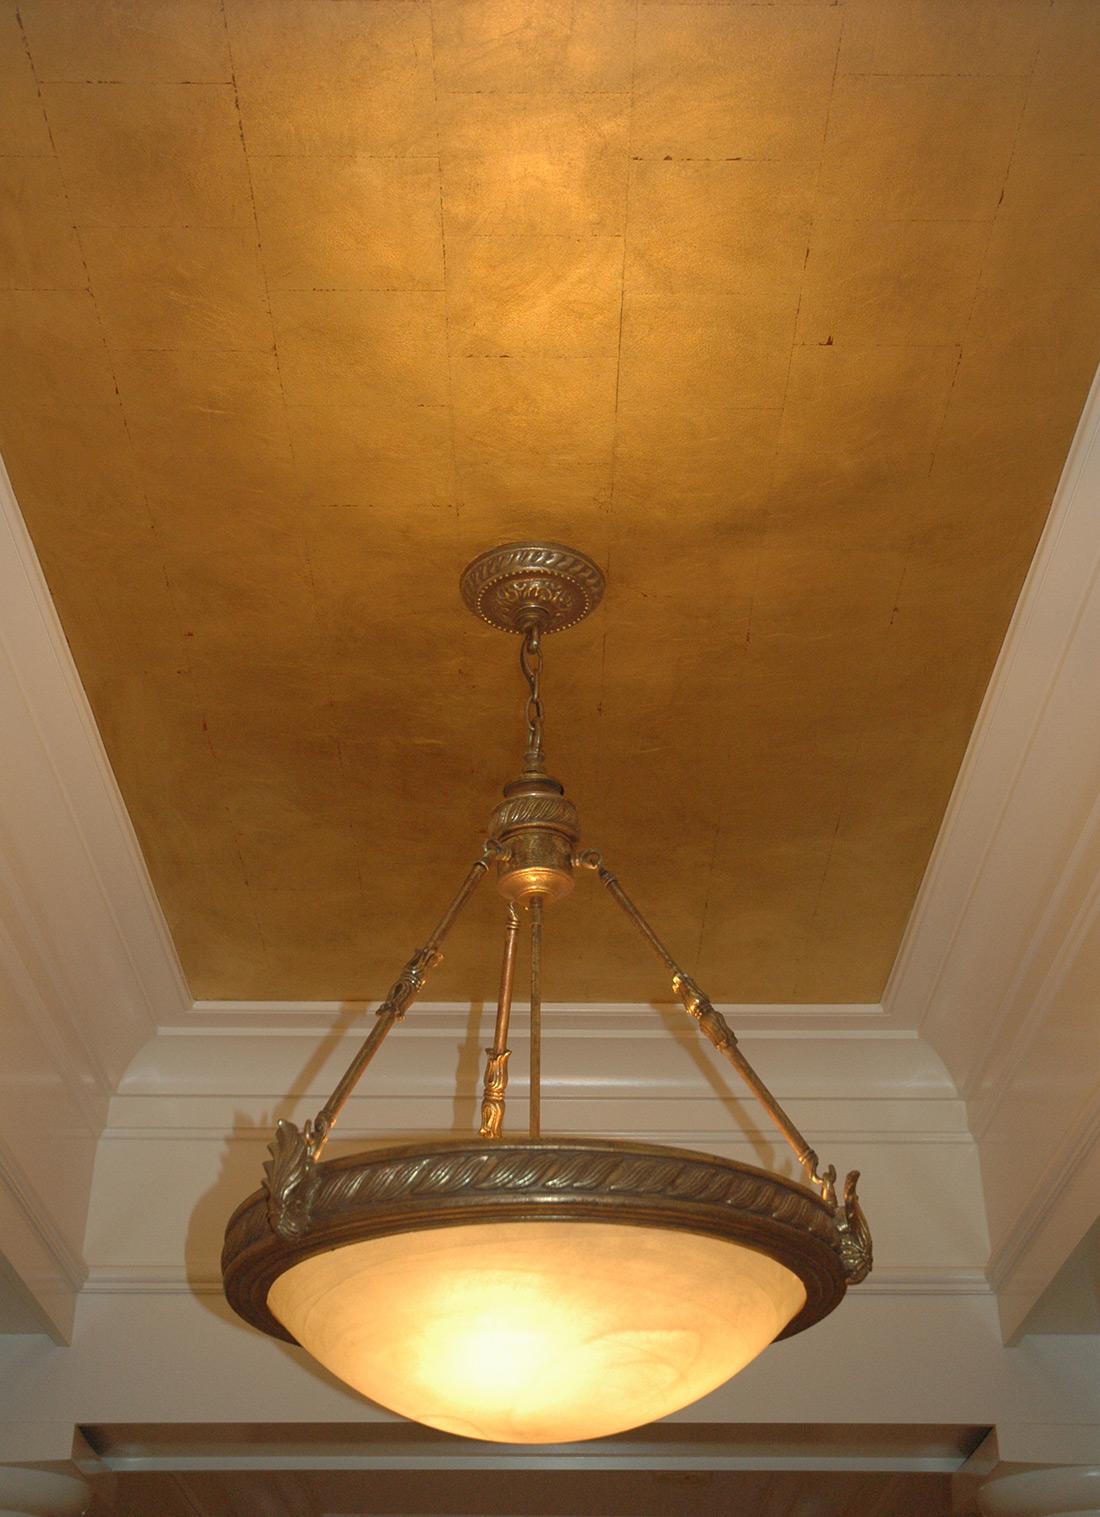 Charming Gold Leaf Ceiling. Fairfax, VA U2014 Karen Dunlap, KMD Interiors